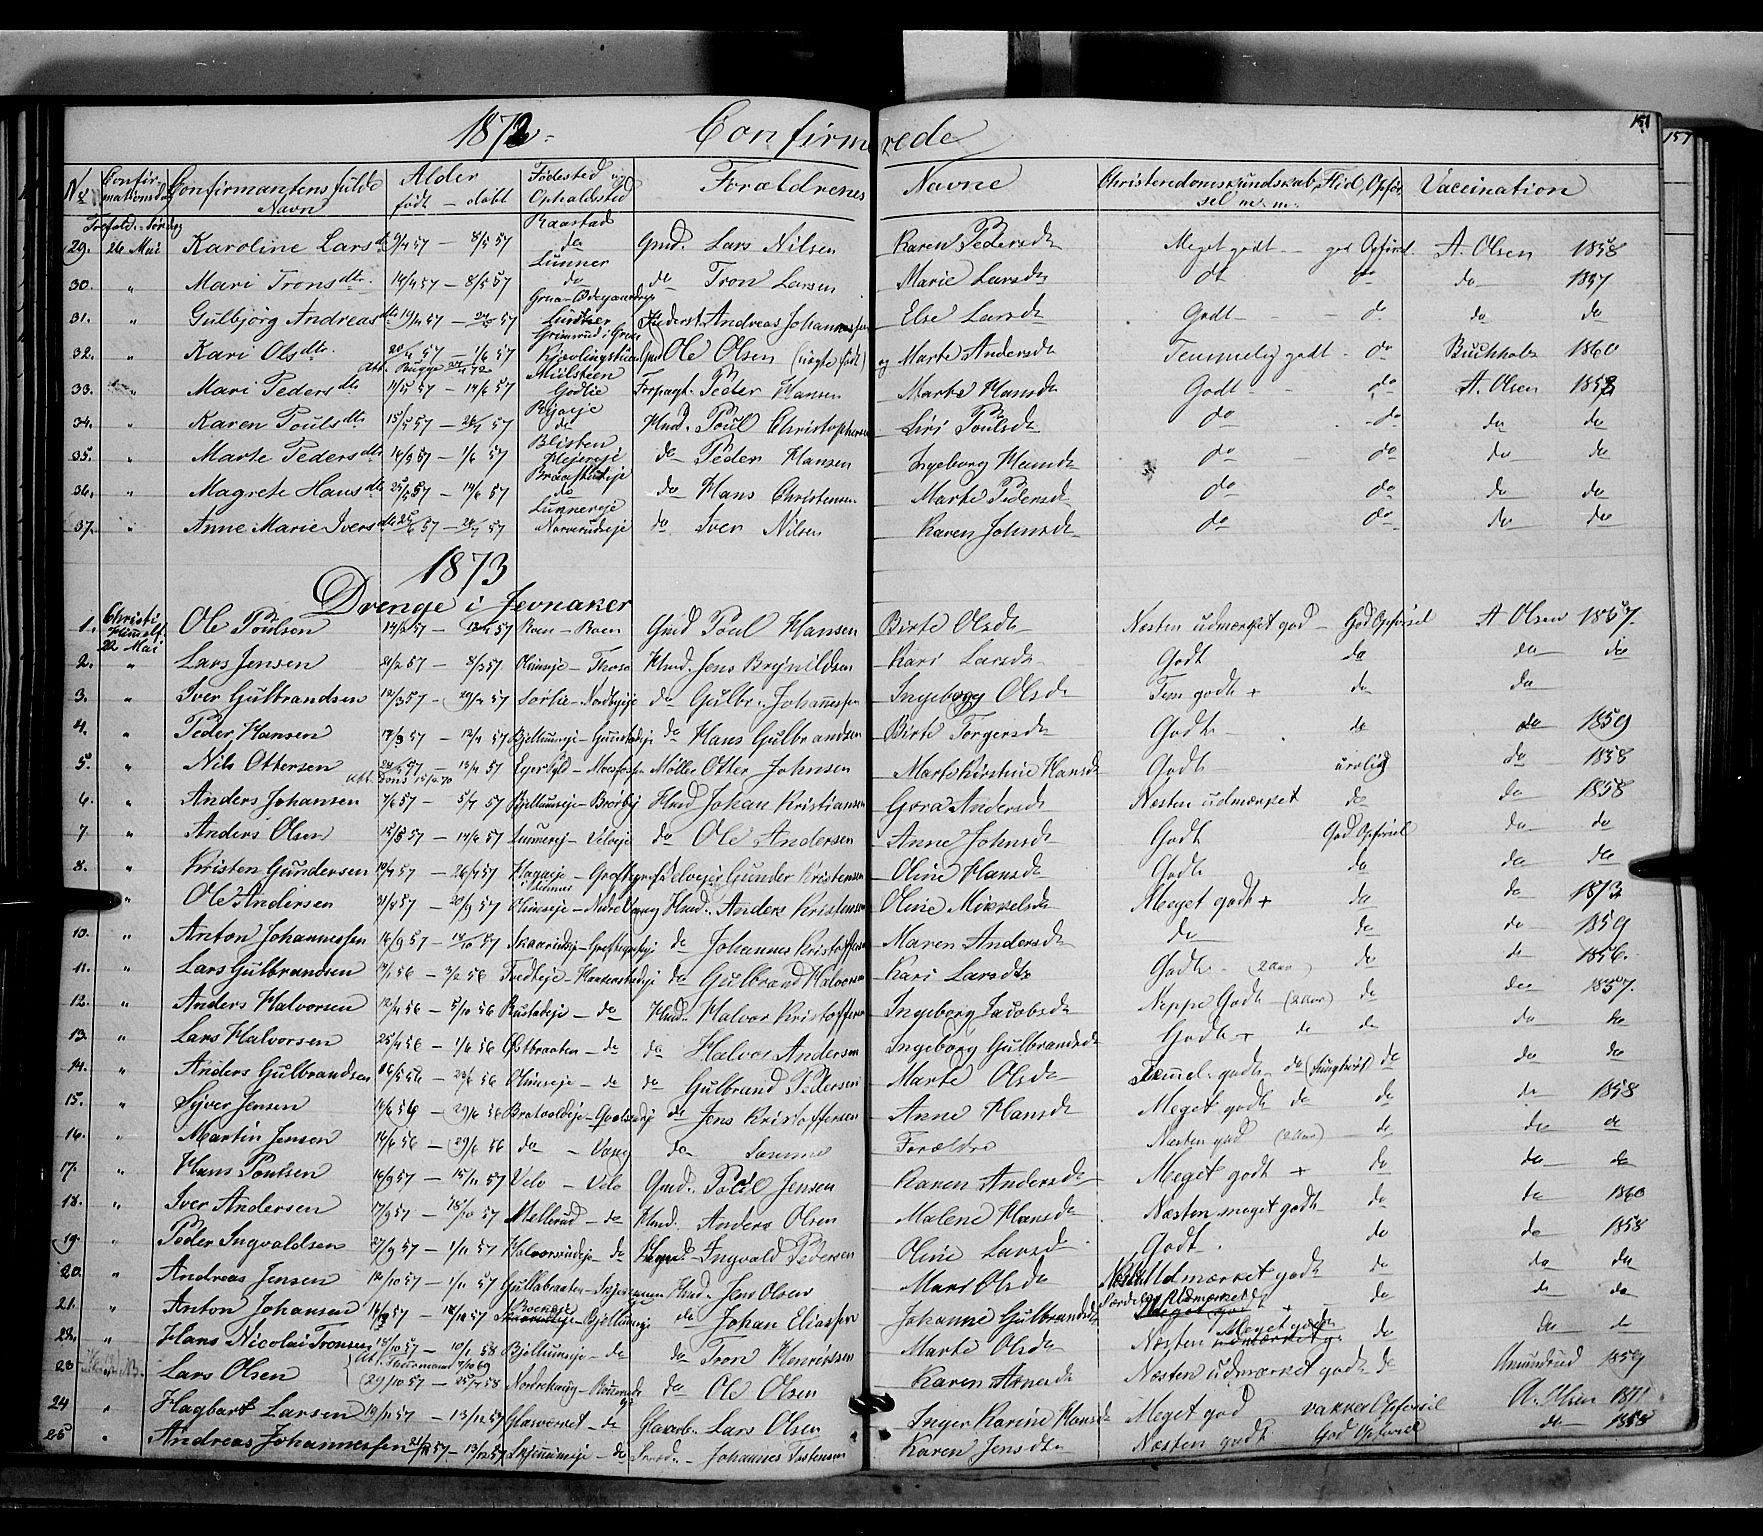 SAH, Jevnaker prestekontor, Ministerialbok nr. 7, 1858-1876, s. 151